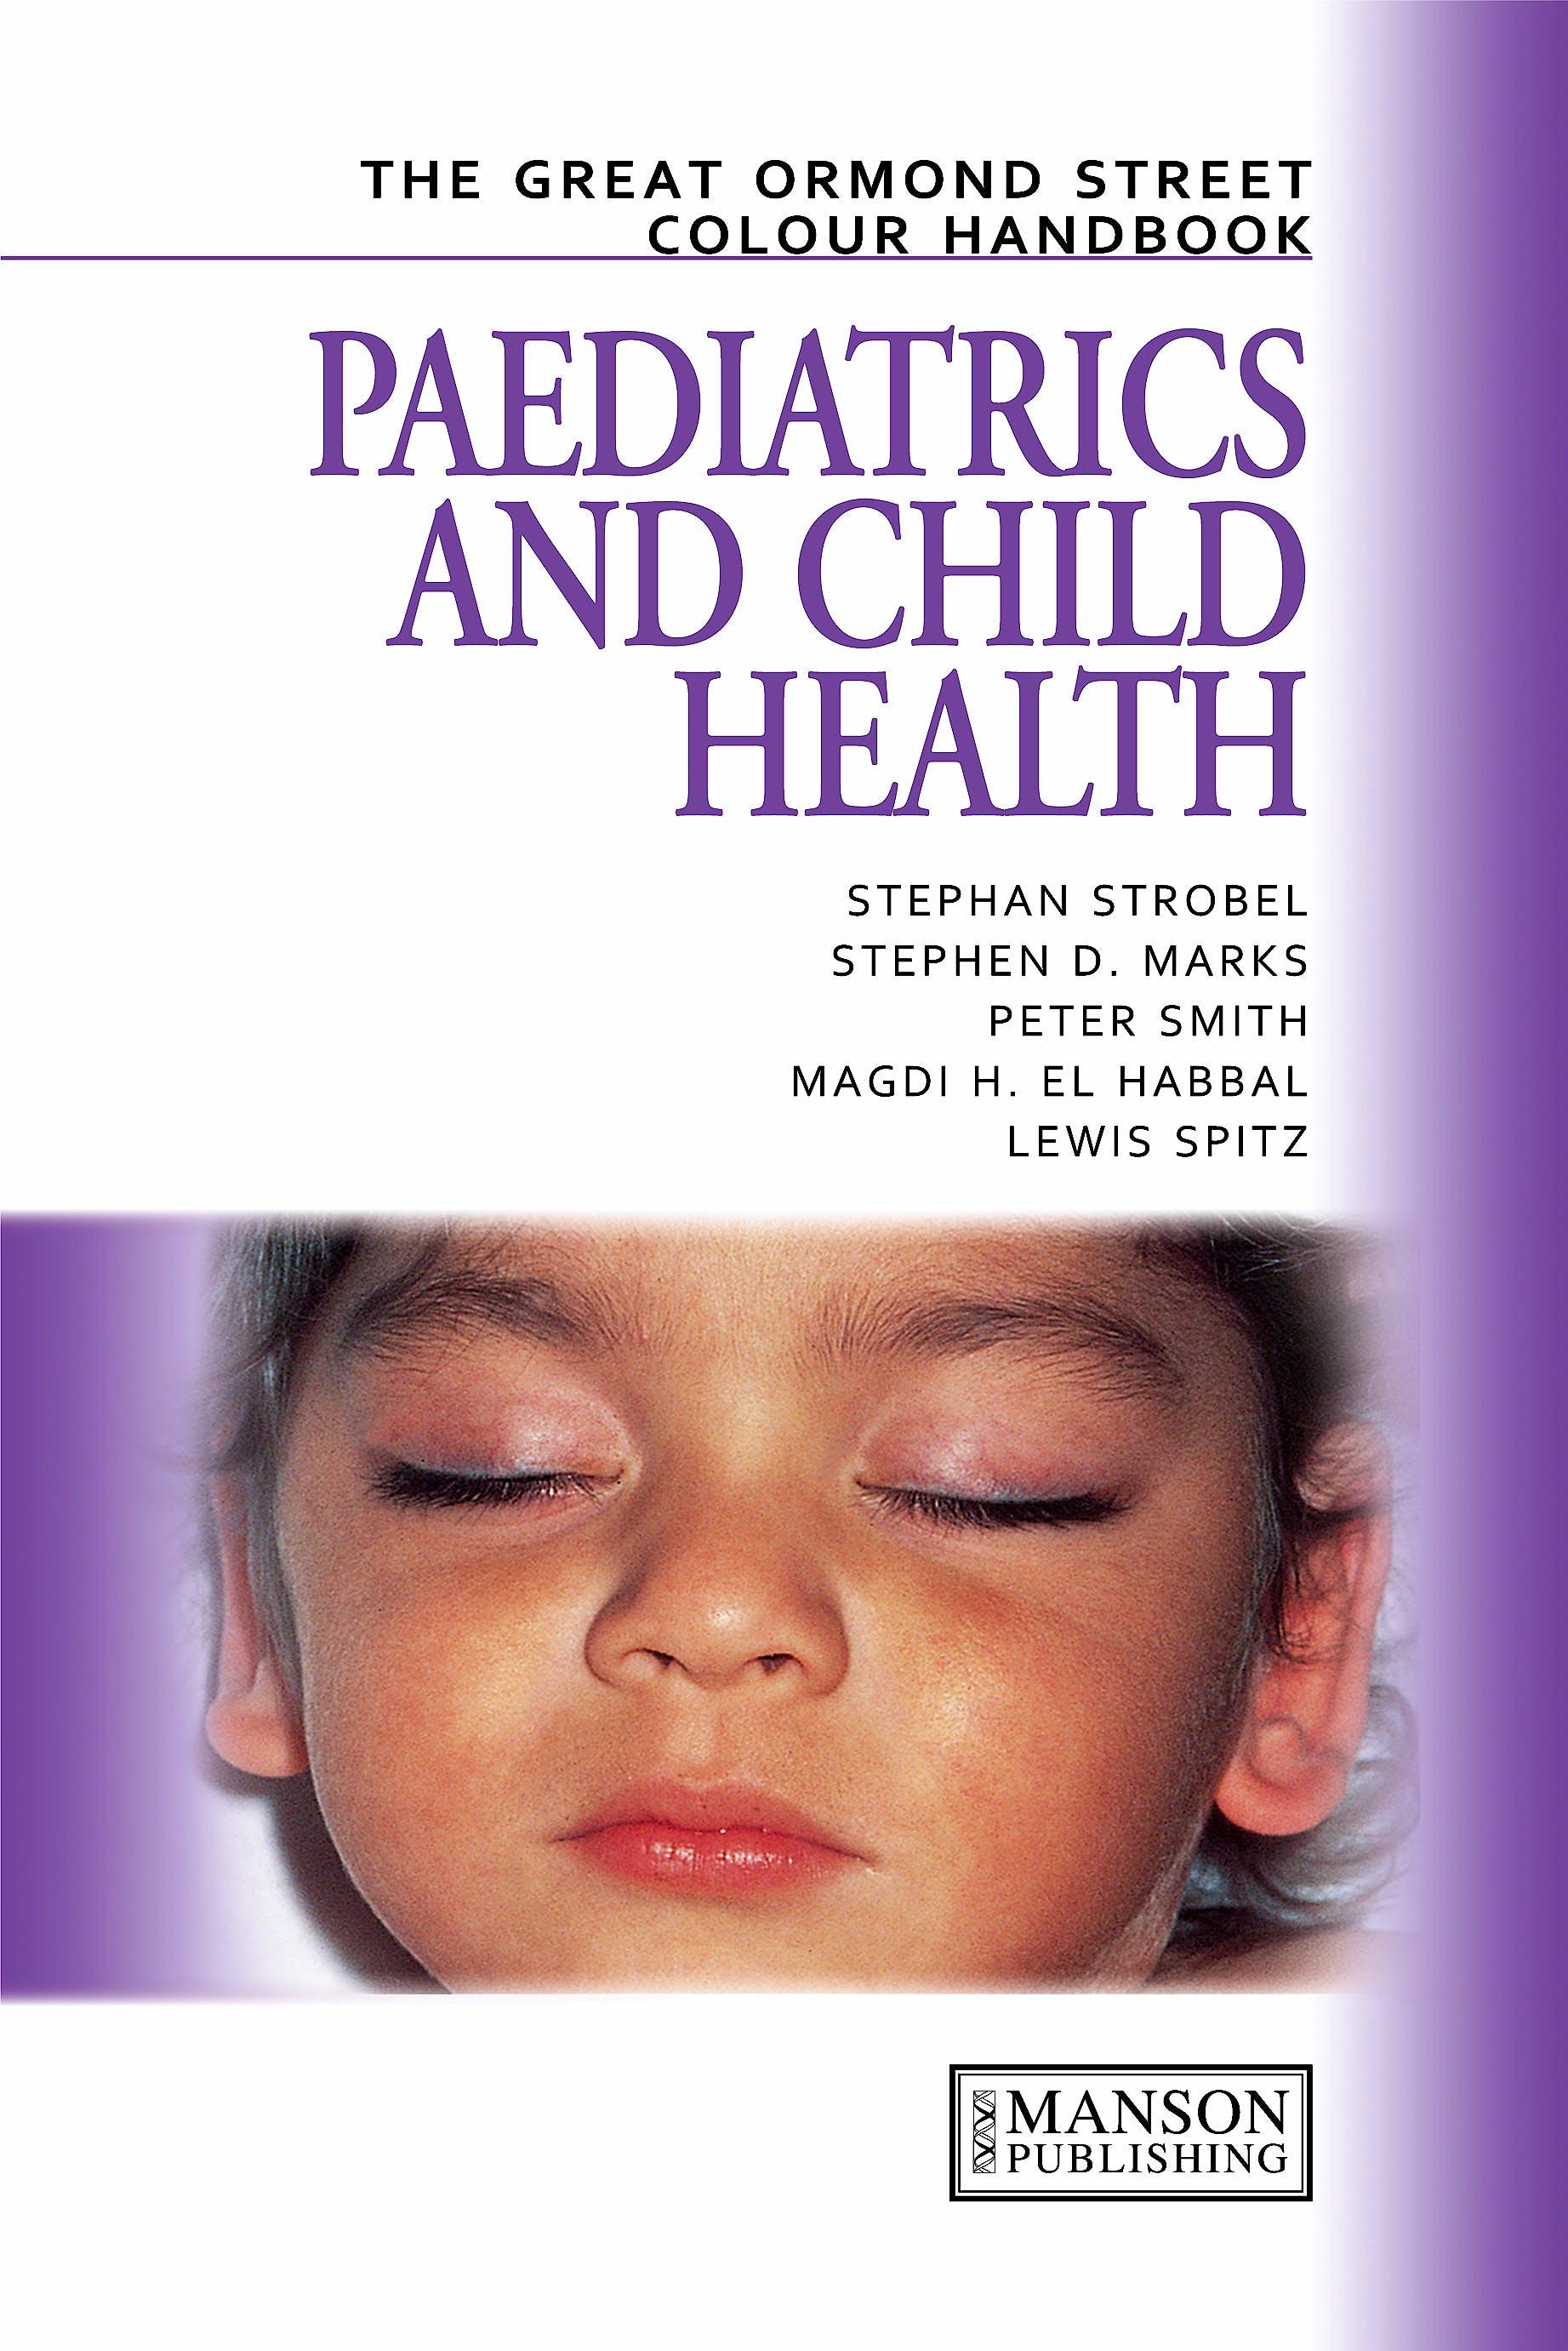 Portada del libro 9781874545279 The Great Ormond Street Colour Handbook of Paediatrics and Child Health